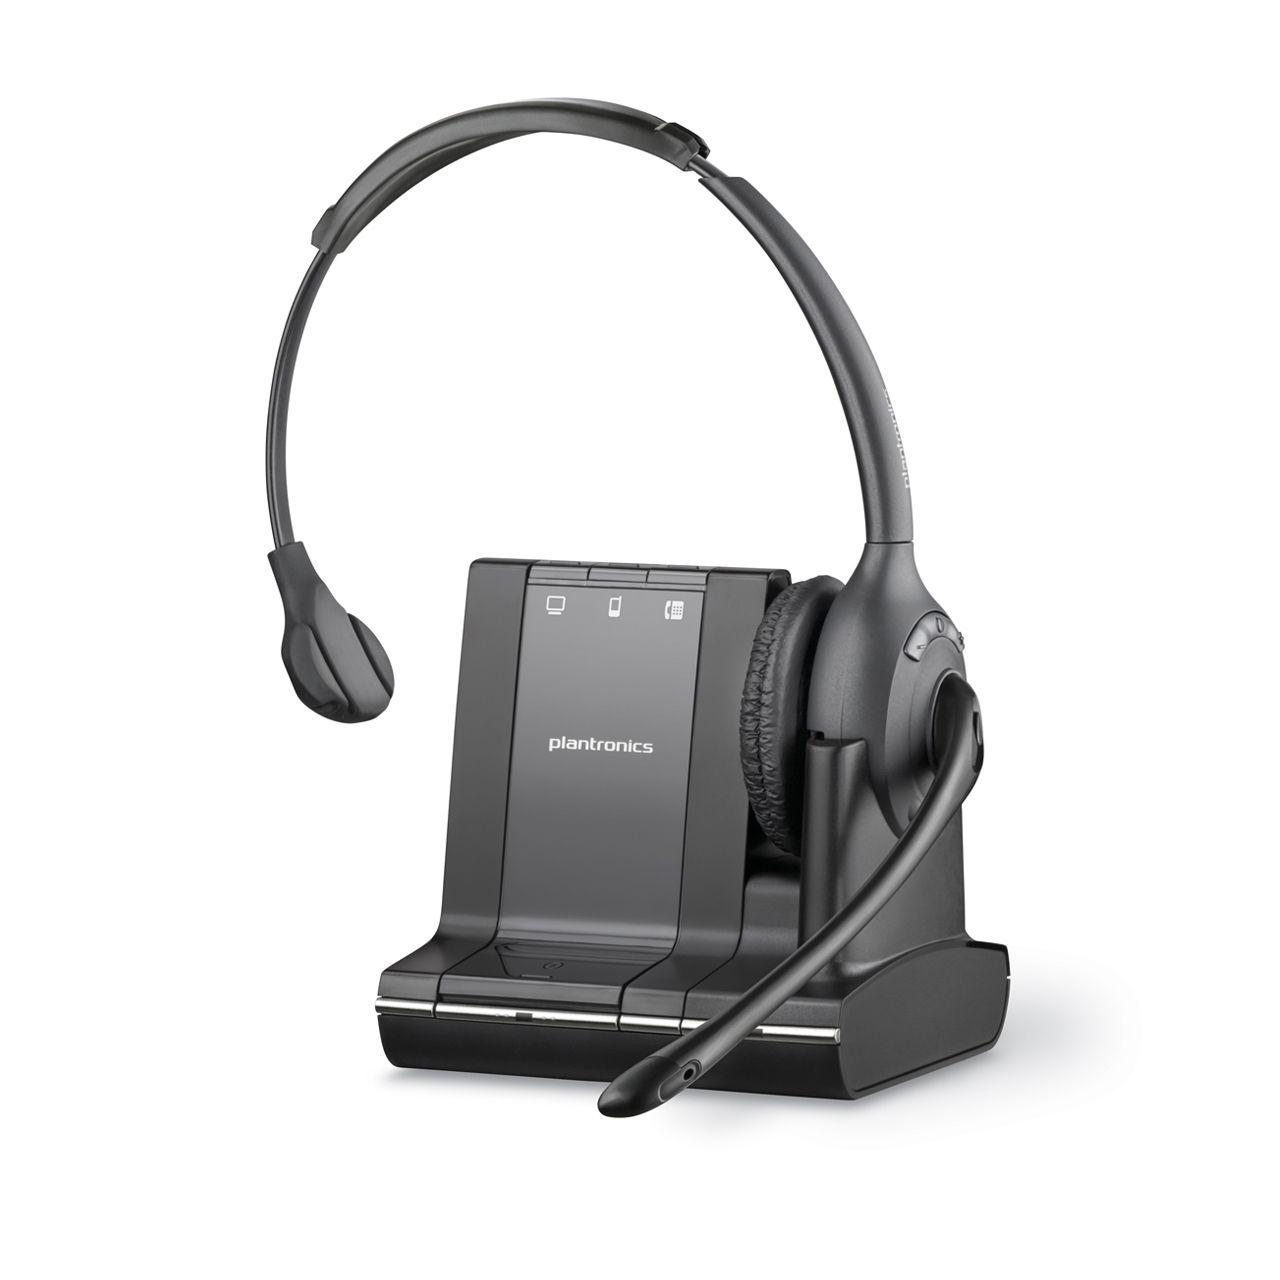 plantronics savi w710 headset ERKAPLW710 Headset met Dock